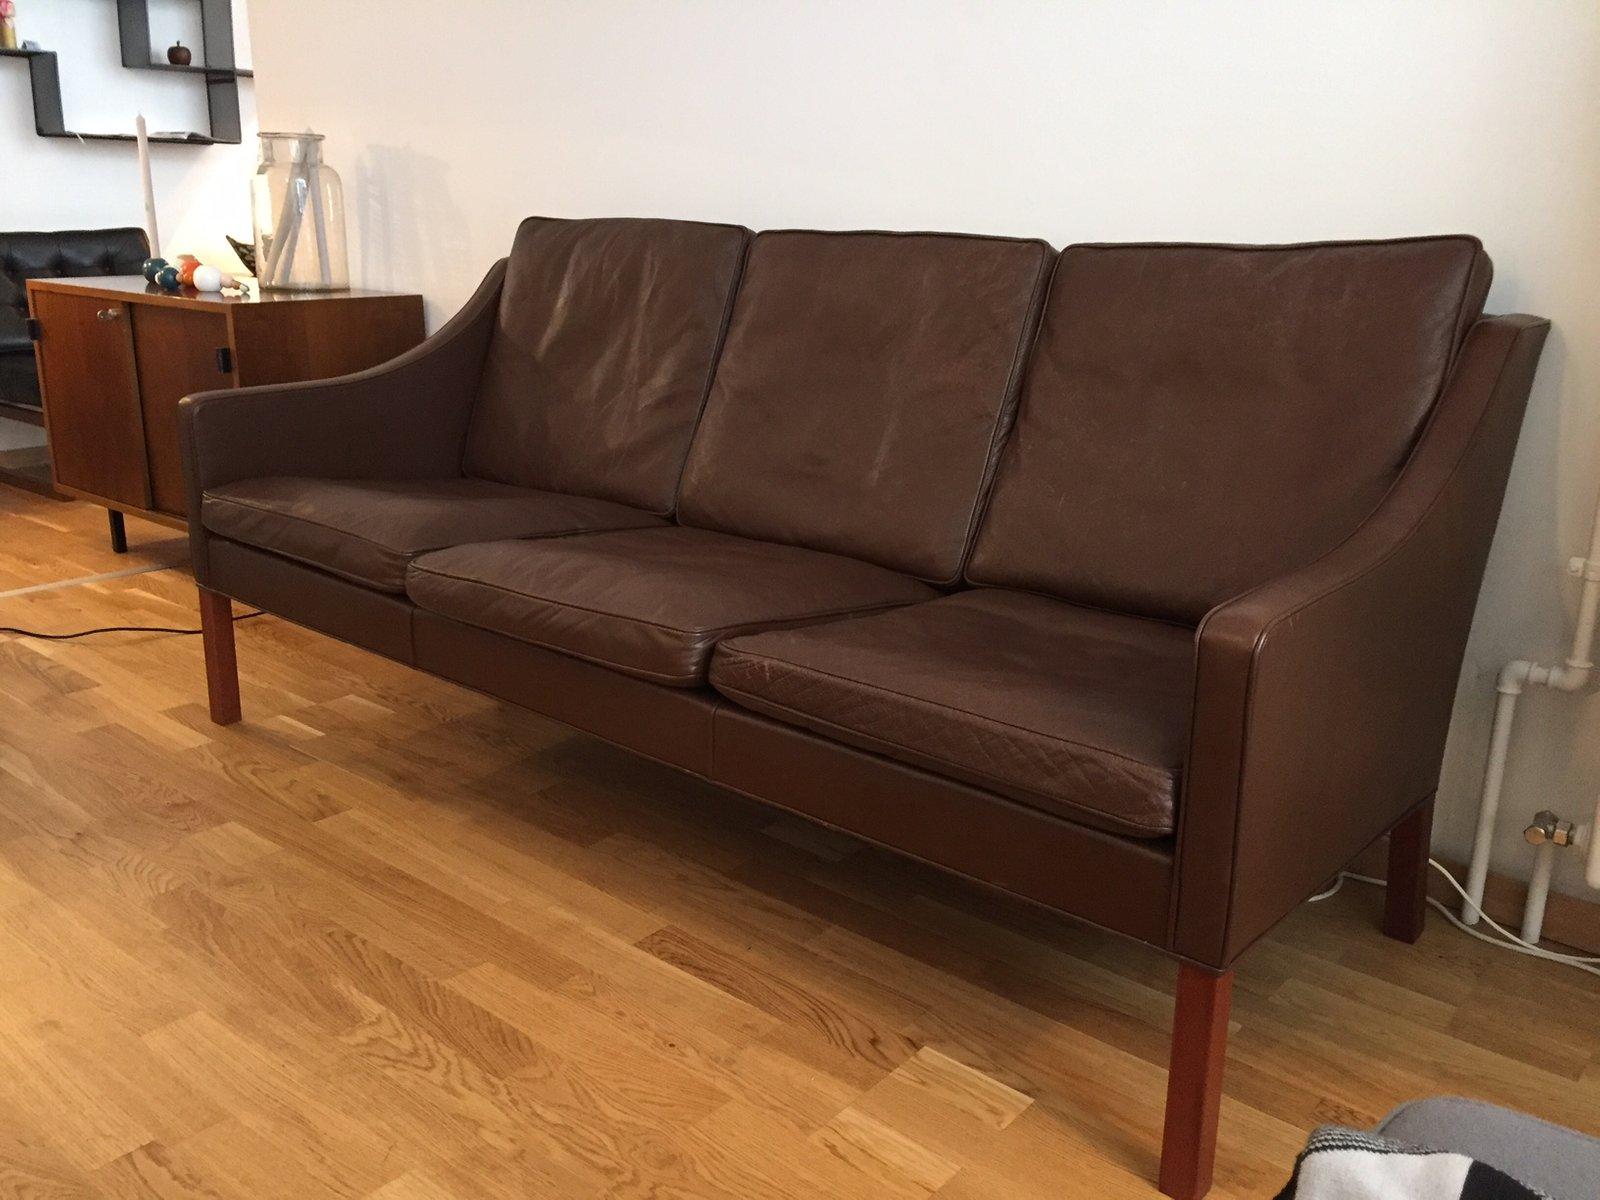 d nisches sofa von borge mogensen f r fredericia. Black Bedroom Furniture Sets. Home Design Ideas